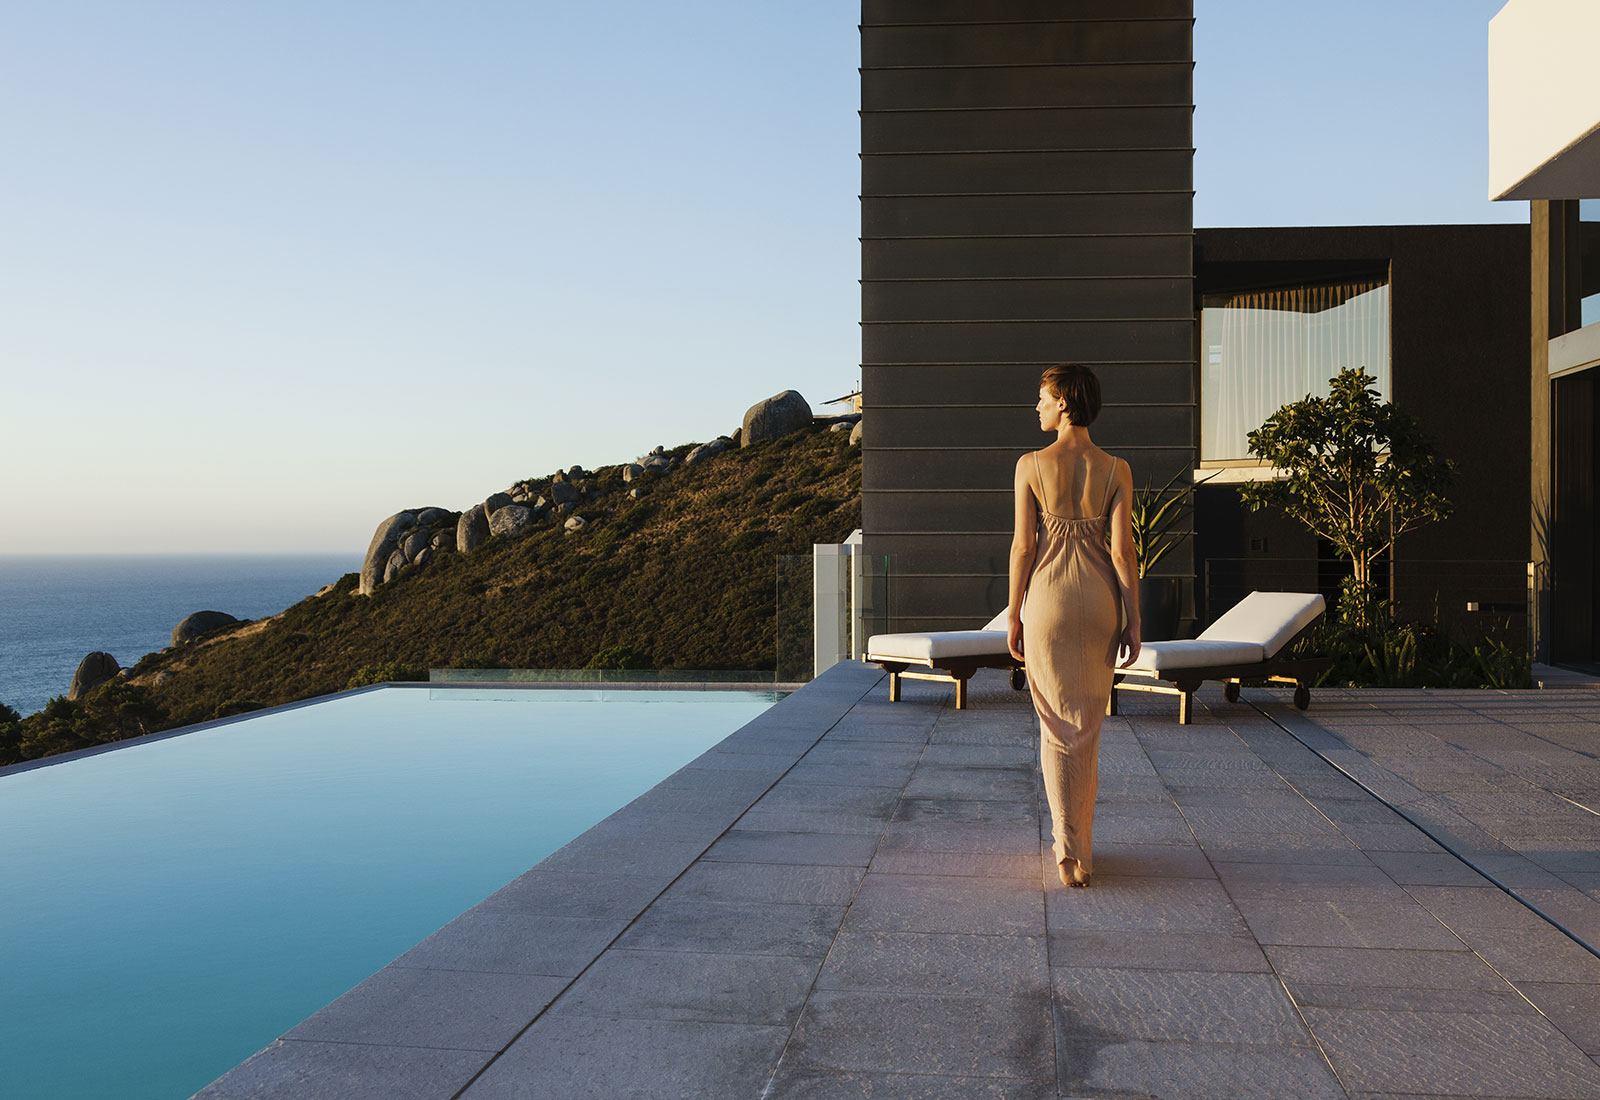 Elegant woman walking near a pool